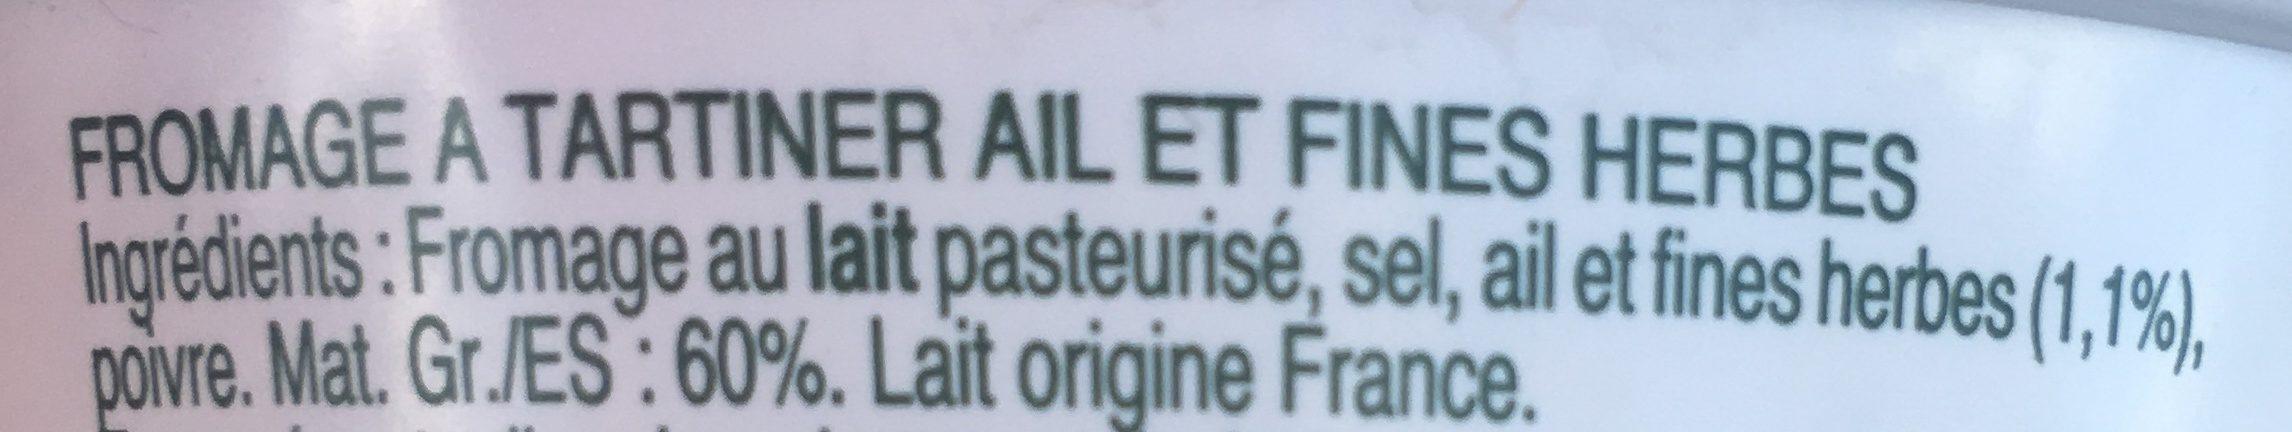 Fromage Ail et Fines Herbes - Ingrédients - fr